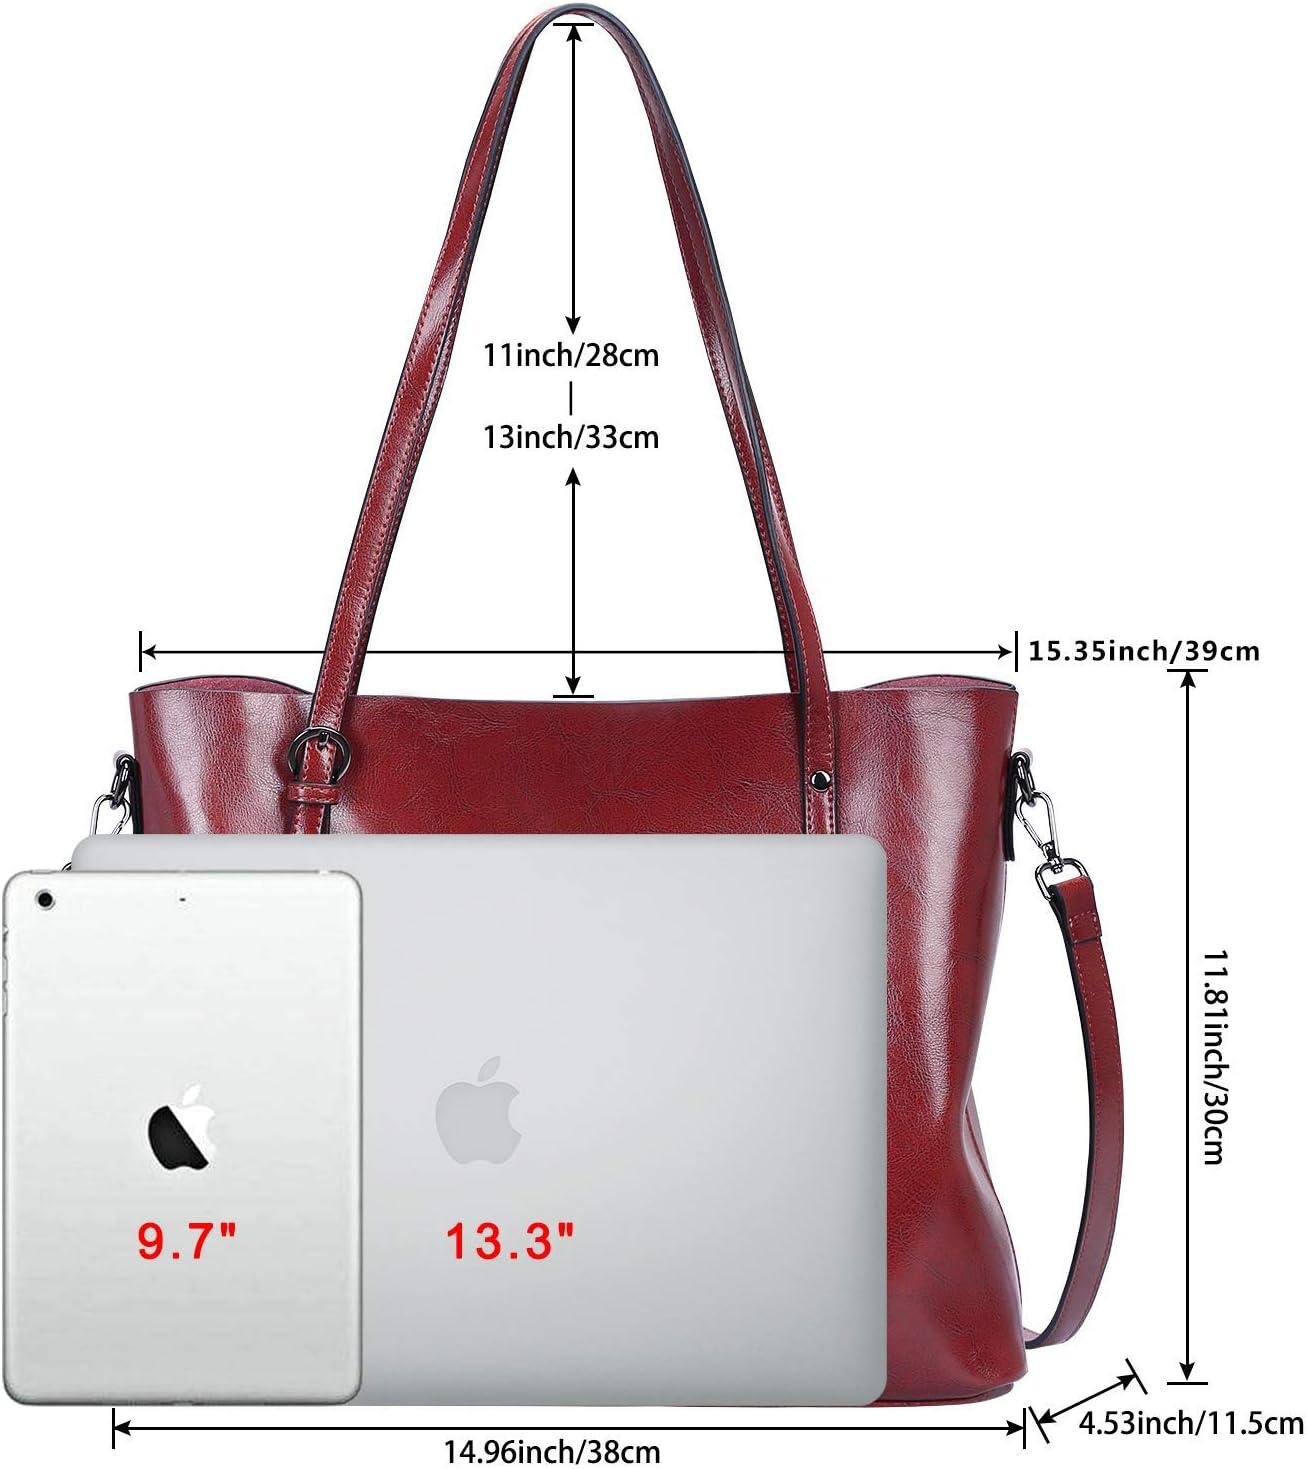 S-ZONE Womens Vintage 3-Way Genuine Leather Tote Shoulder Bag Handbag Fashion Handbag Messenger Bag